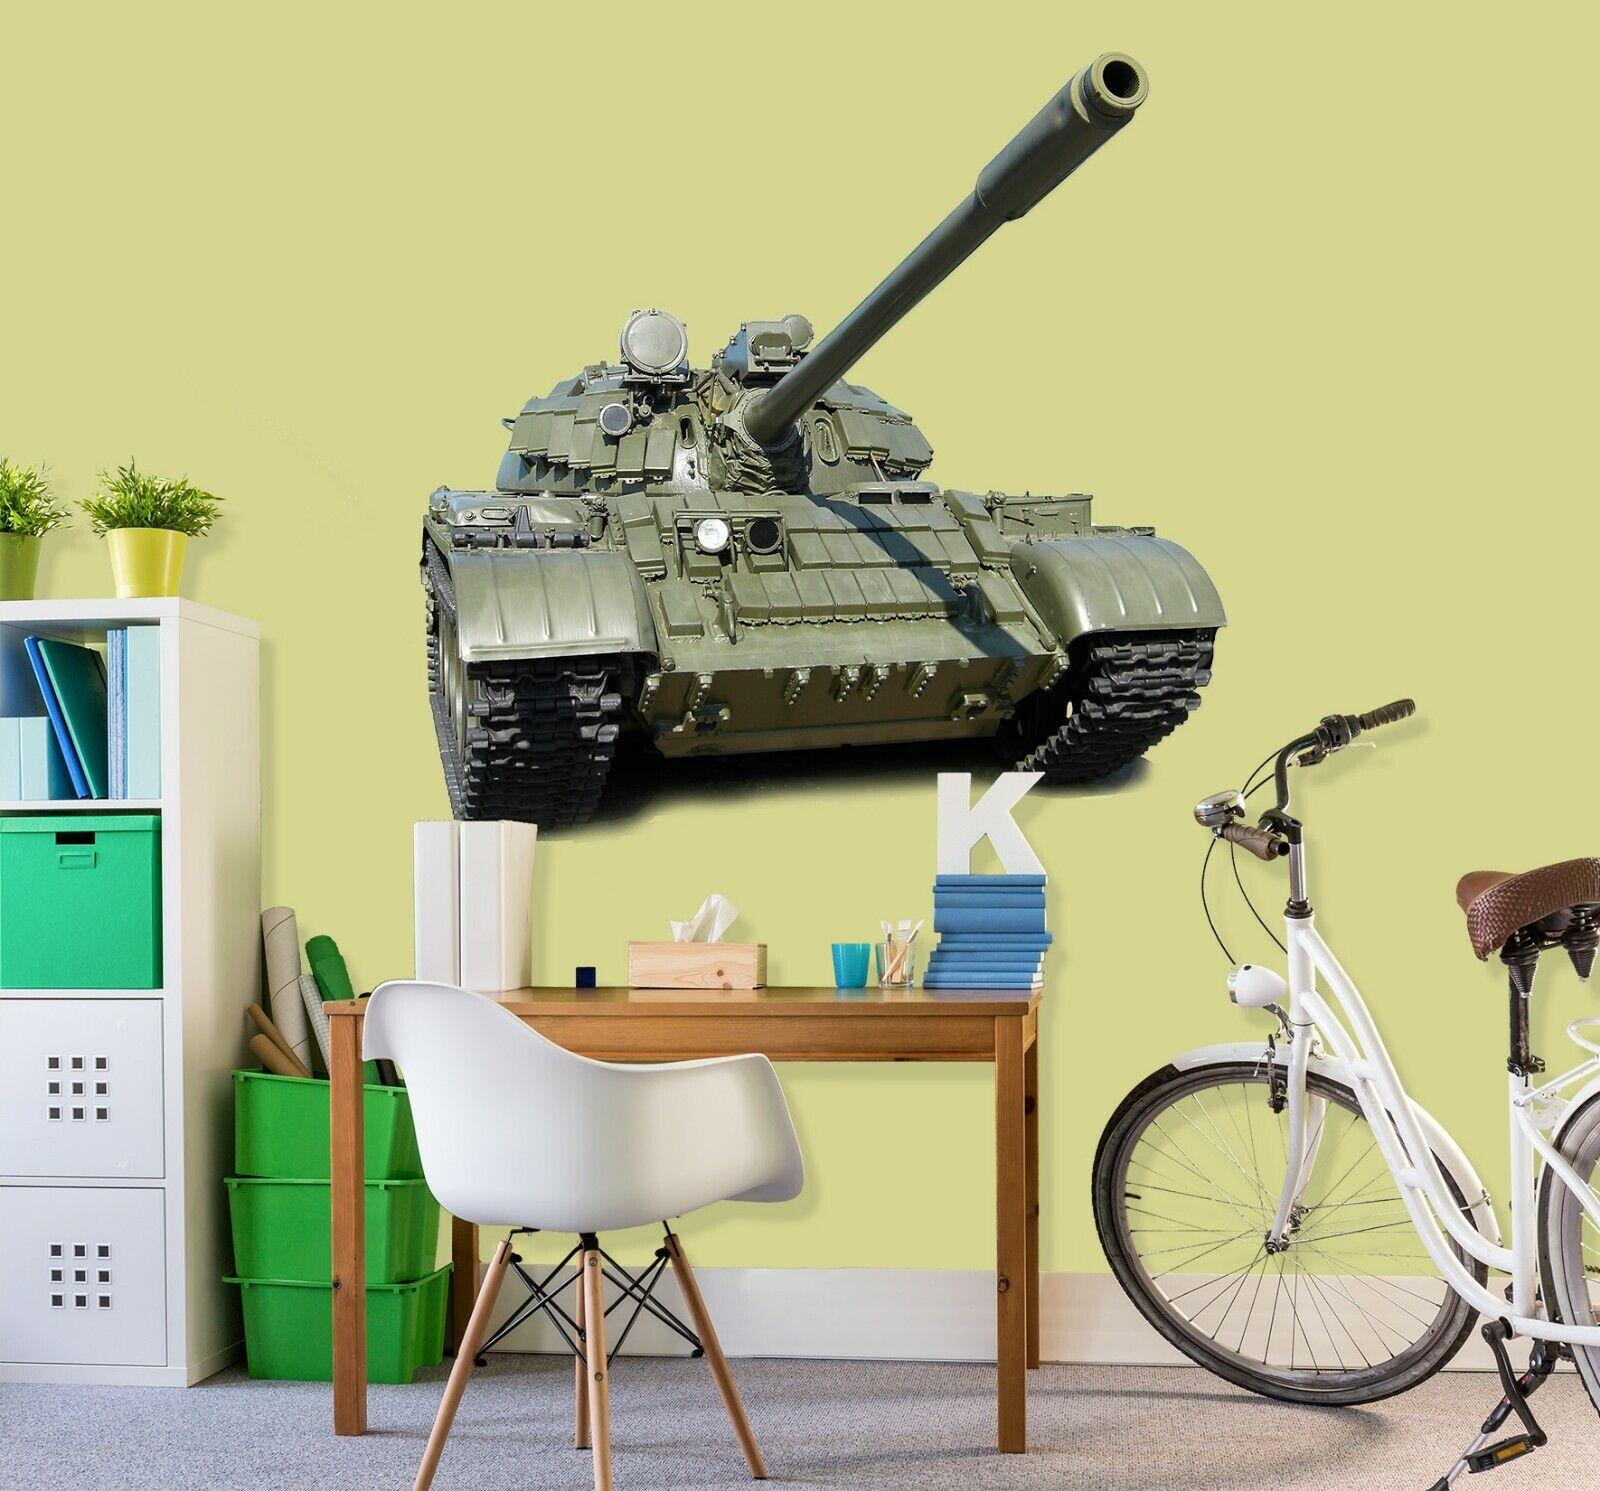 3D Tank Handsome G02 Car Wallpaper Mural Poster Transport Wall Stickers Wendy